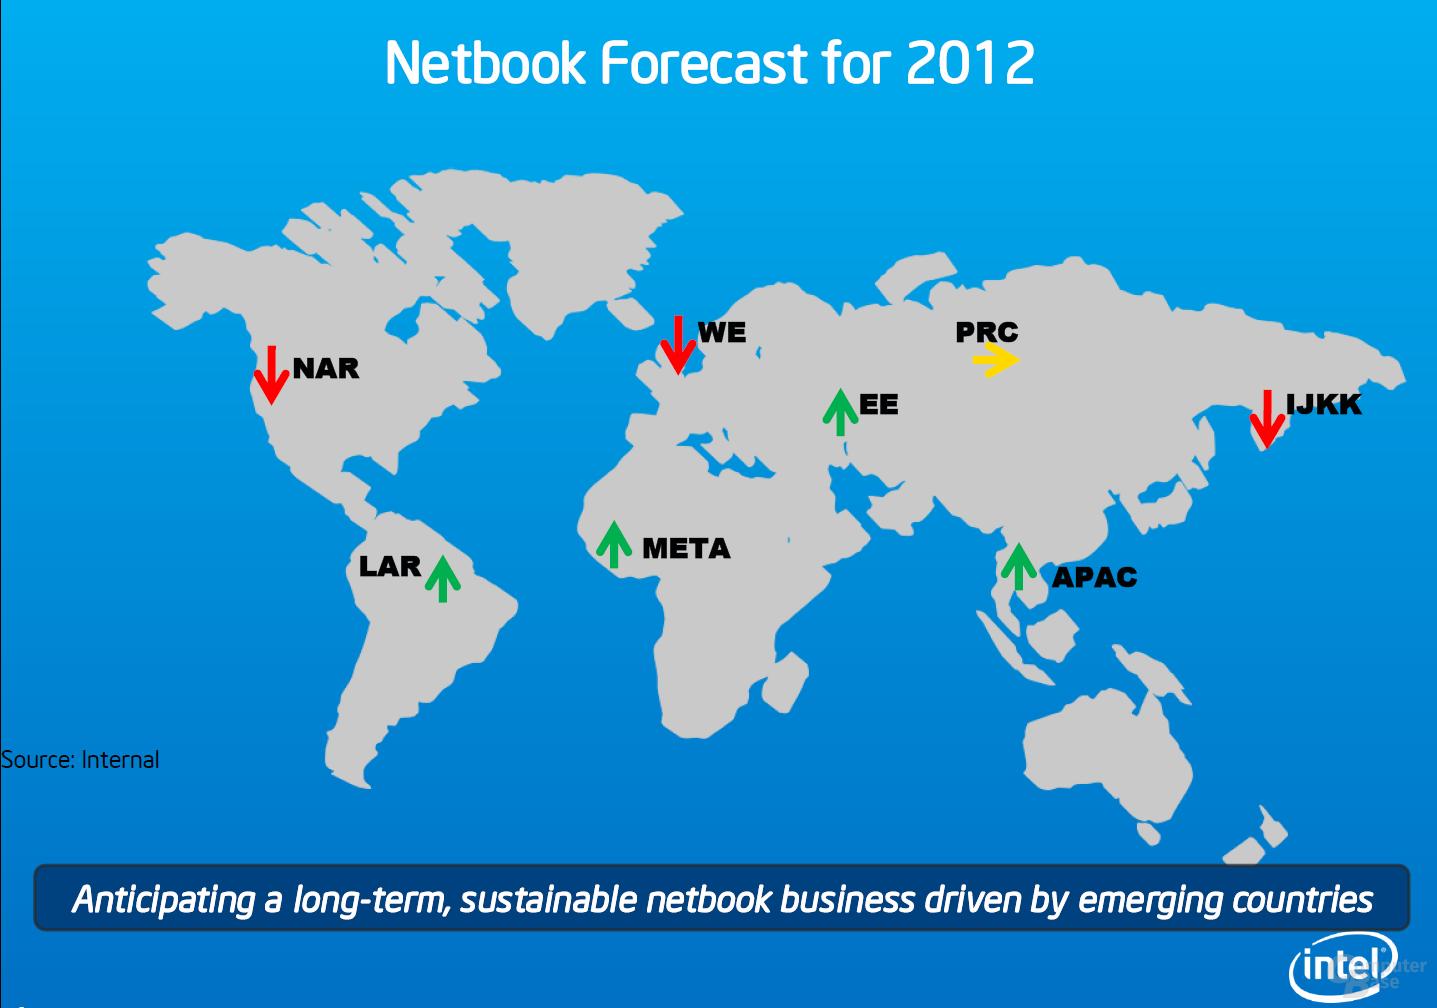 Wachstumsmärkte für Netbooks